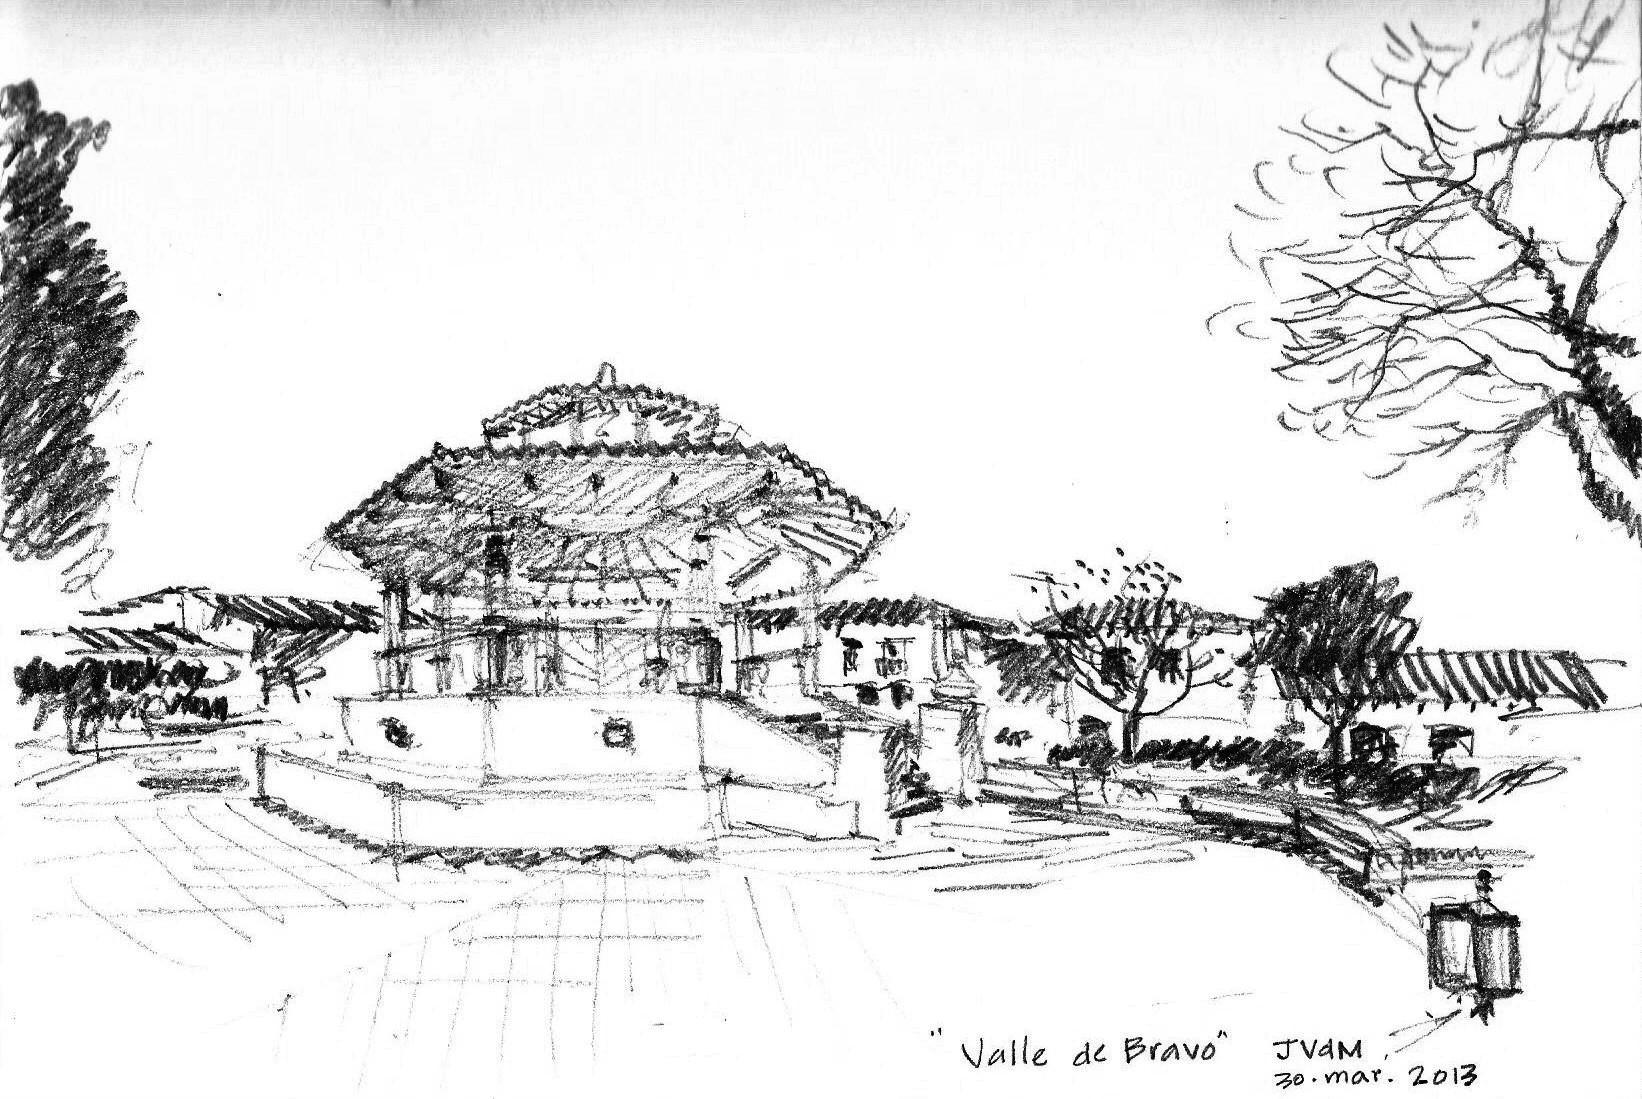 Valle de Bravo abr13 -02.jpg